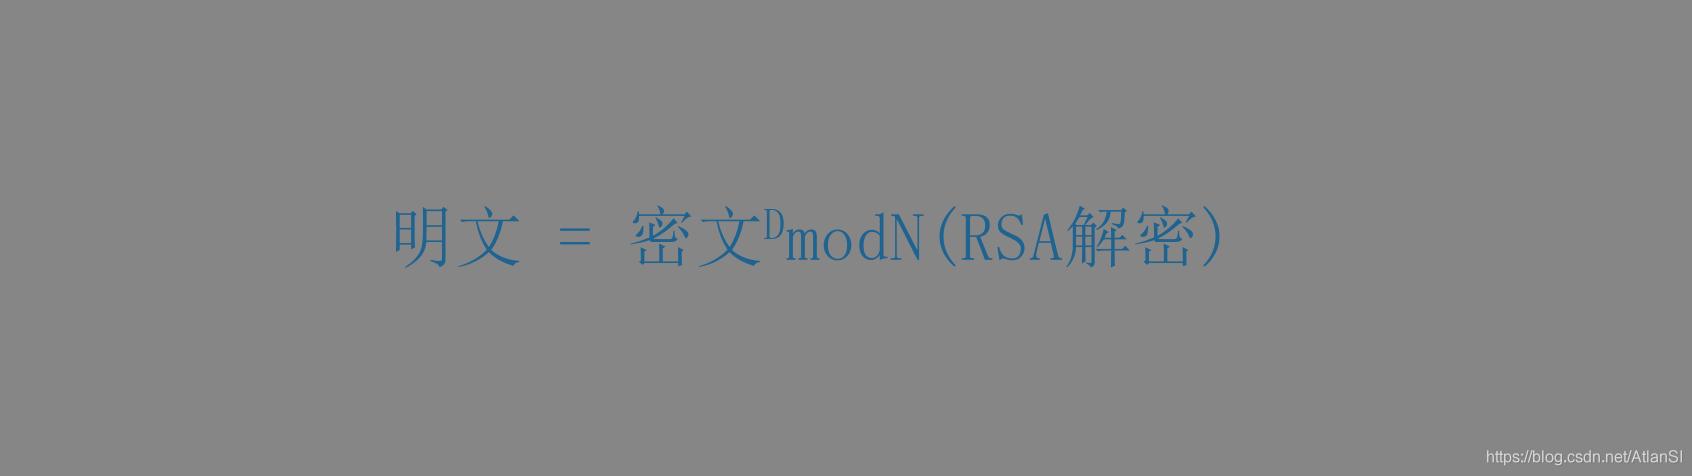 RSA解密公式